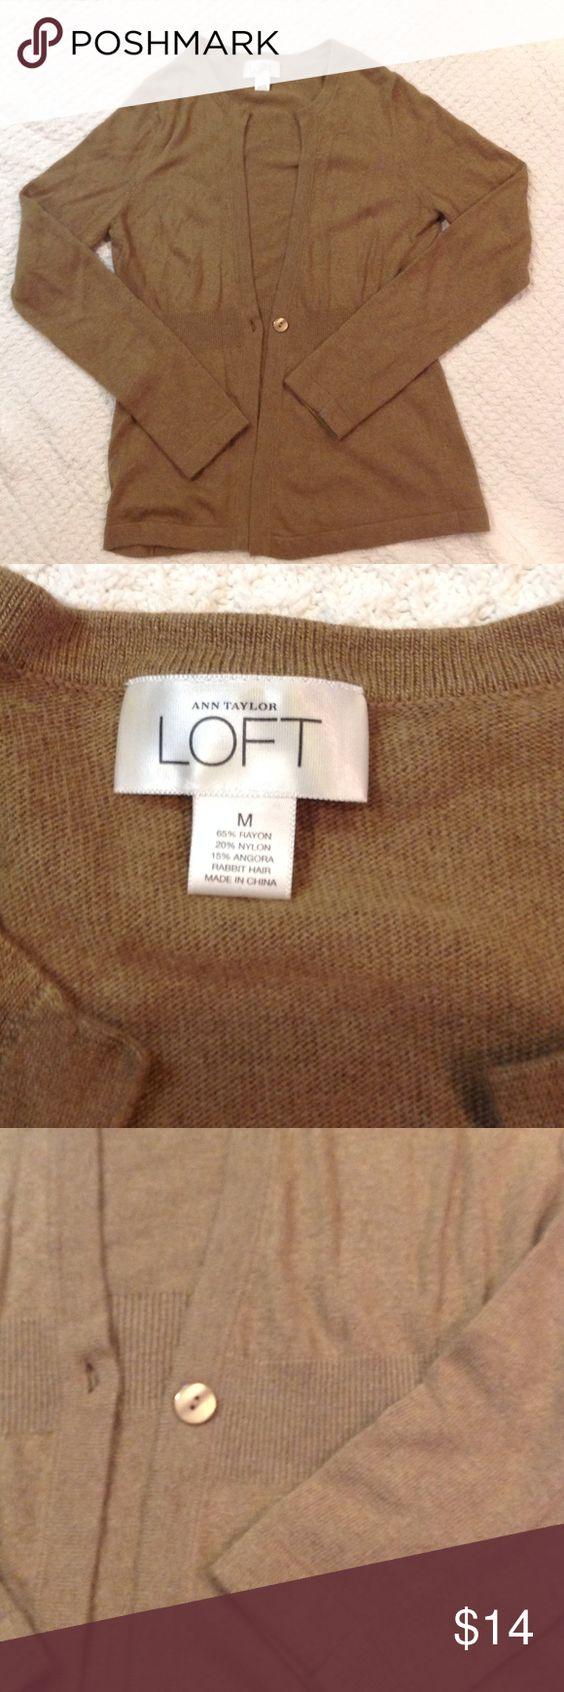 Loft super soft sweater Loft cardigan in excellent shape. One button closure. LOFT Sweaters Cardigans